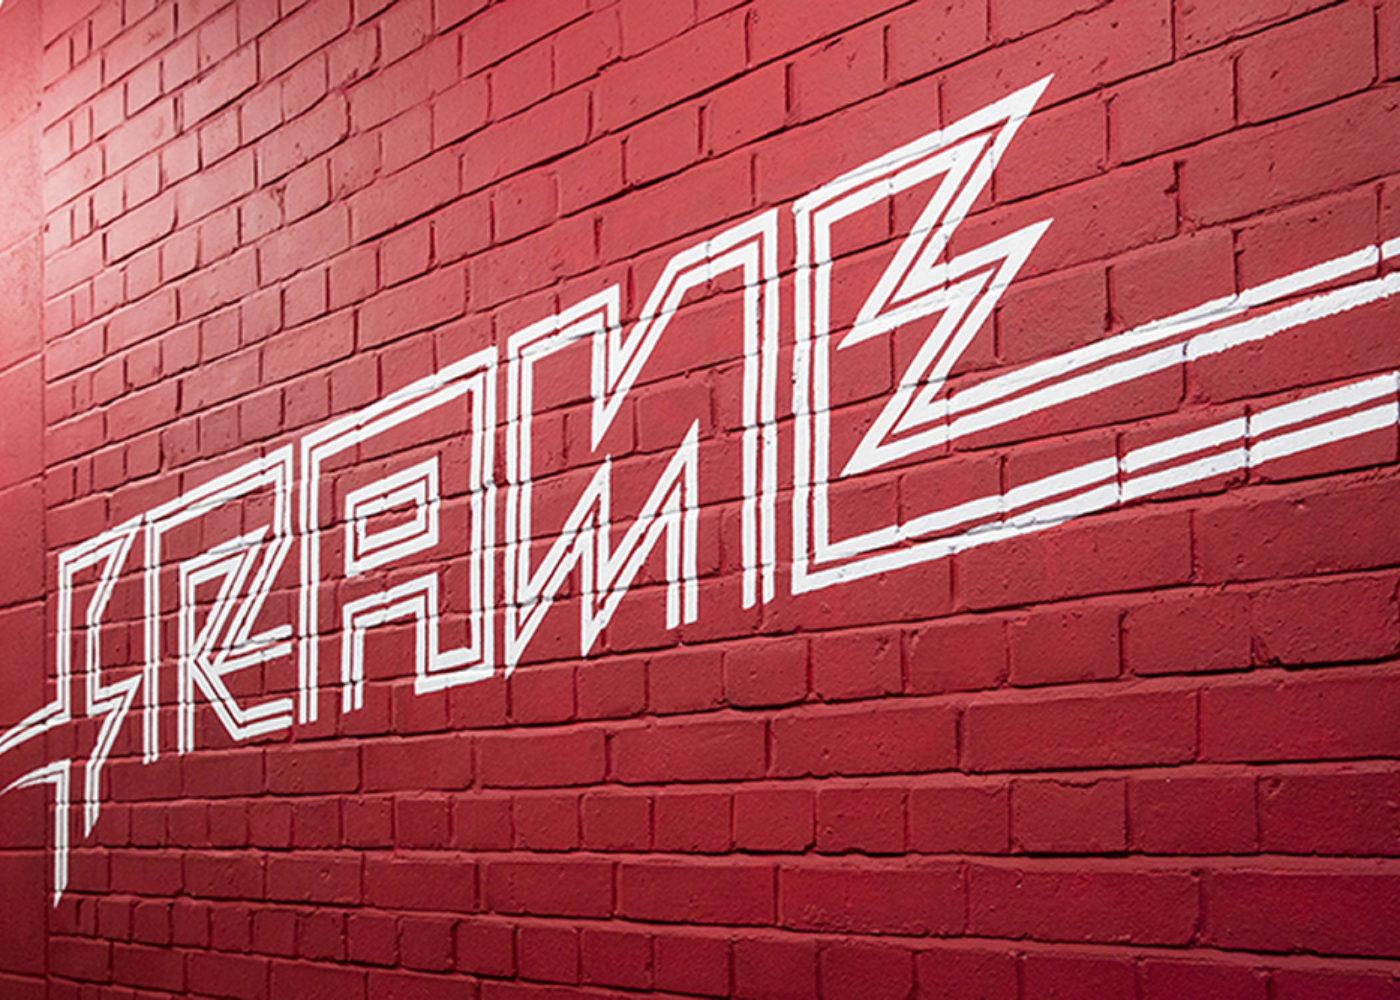 FRAME-03-21-16-Victoria-Studio-006